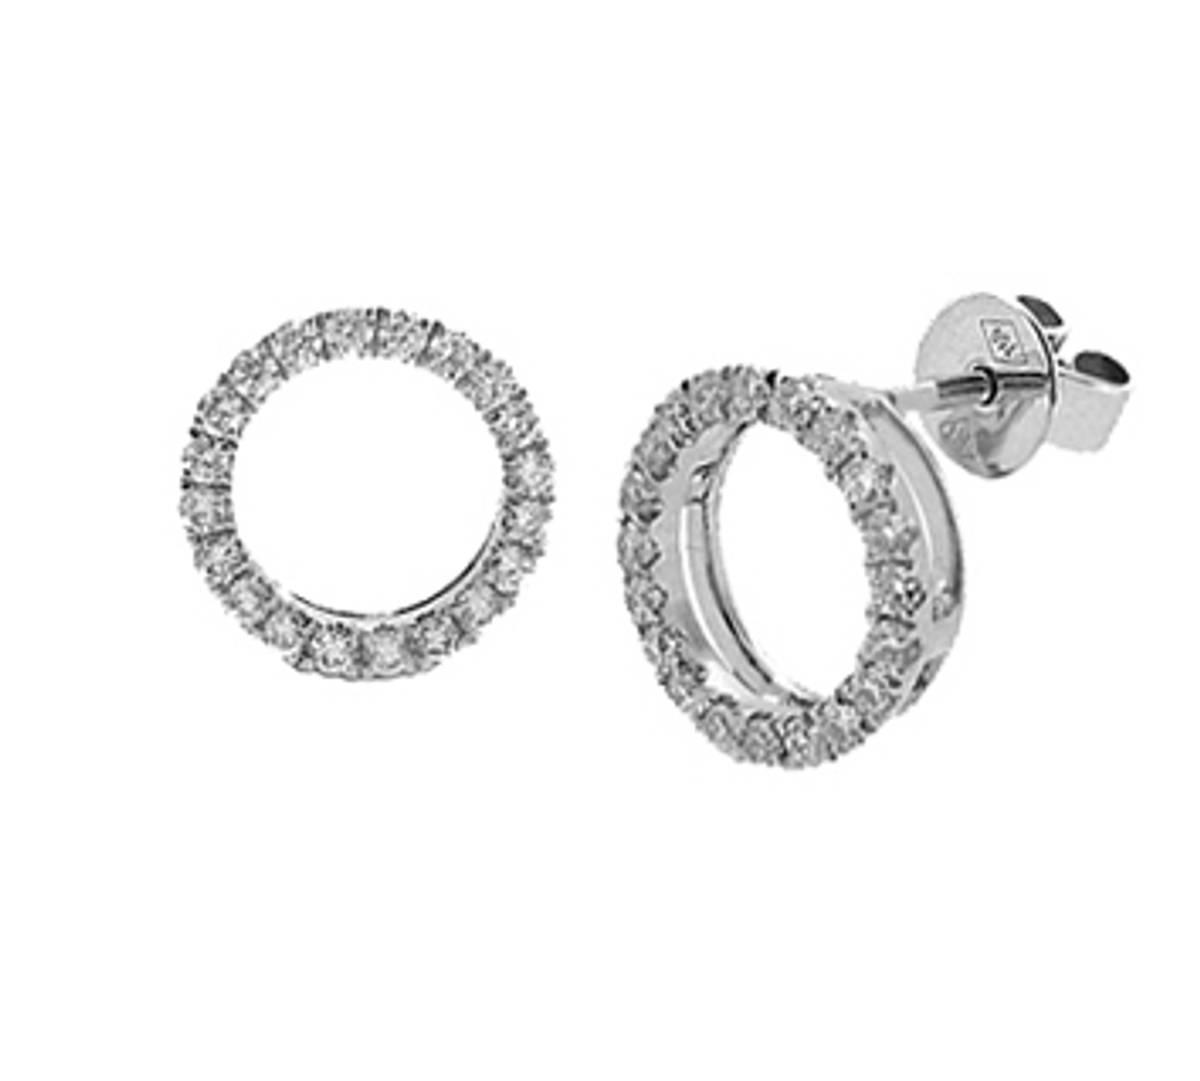 18k white gold brilliant cut diamond stud ringDETAILStotal diamond weight 0.38cts18k white gold